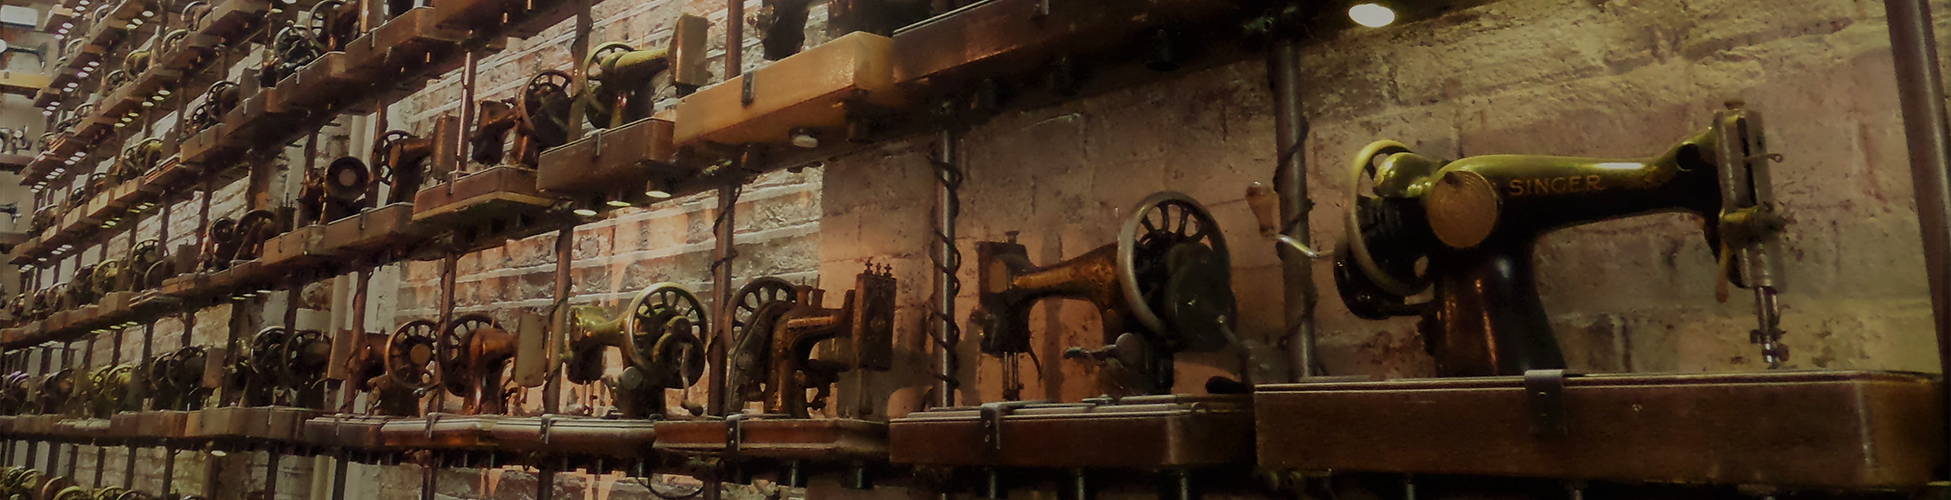 De Kostuumfabriek